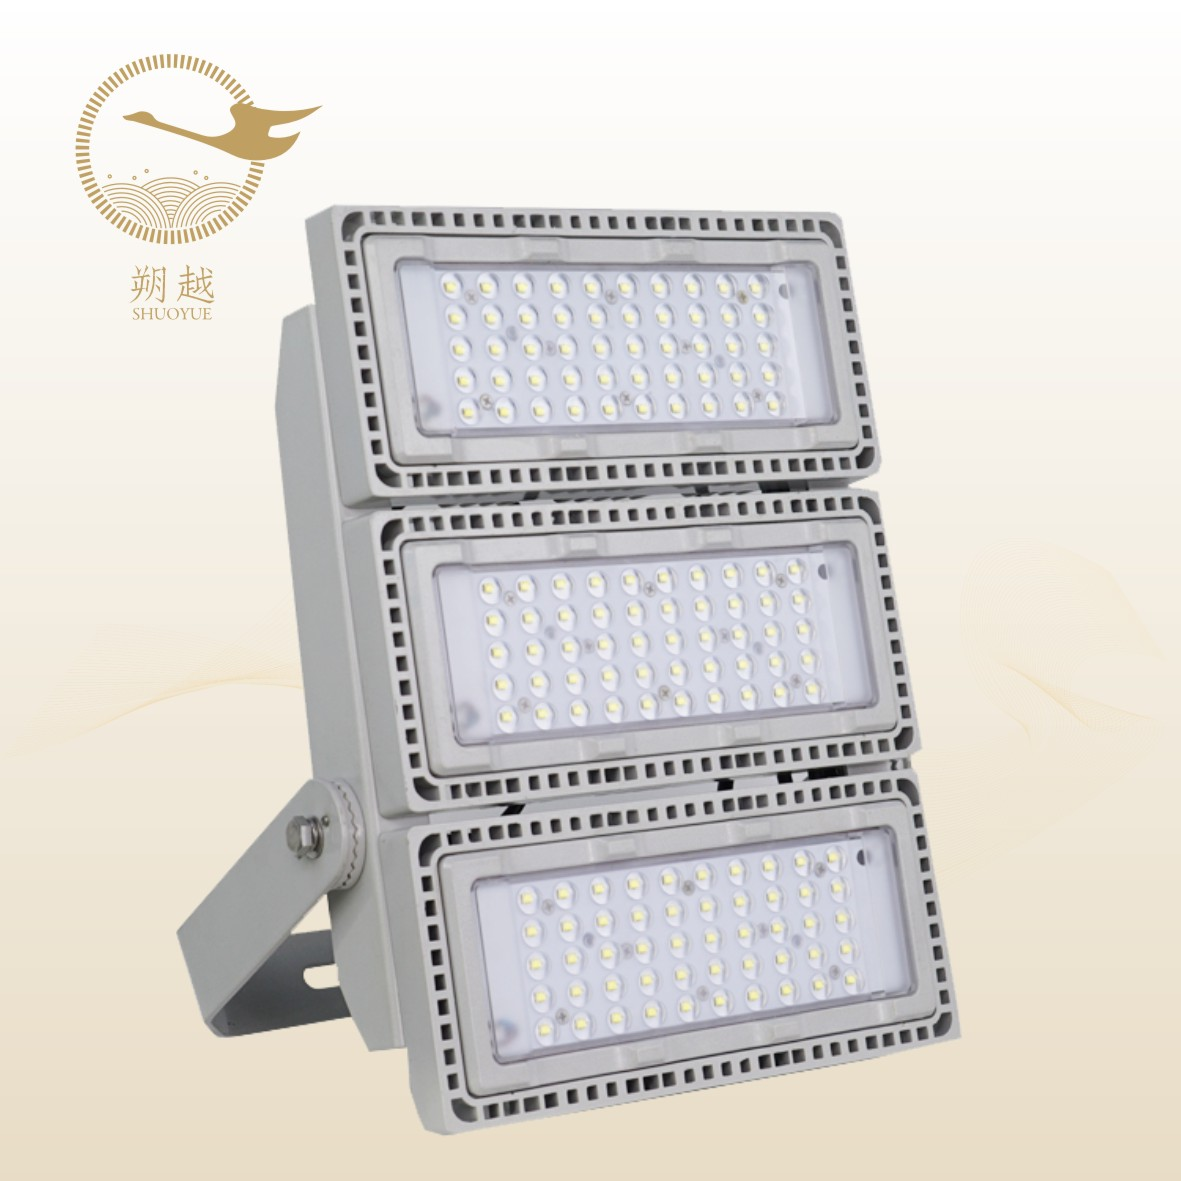 固定式LED灯具 KRS5029E(300W)